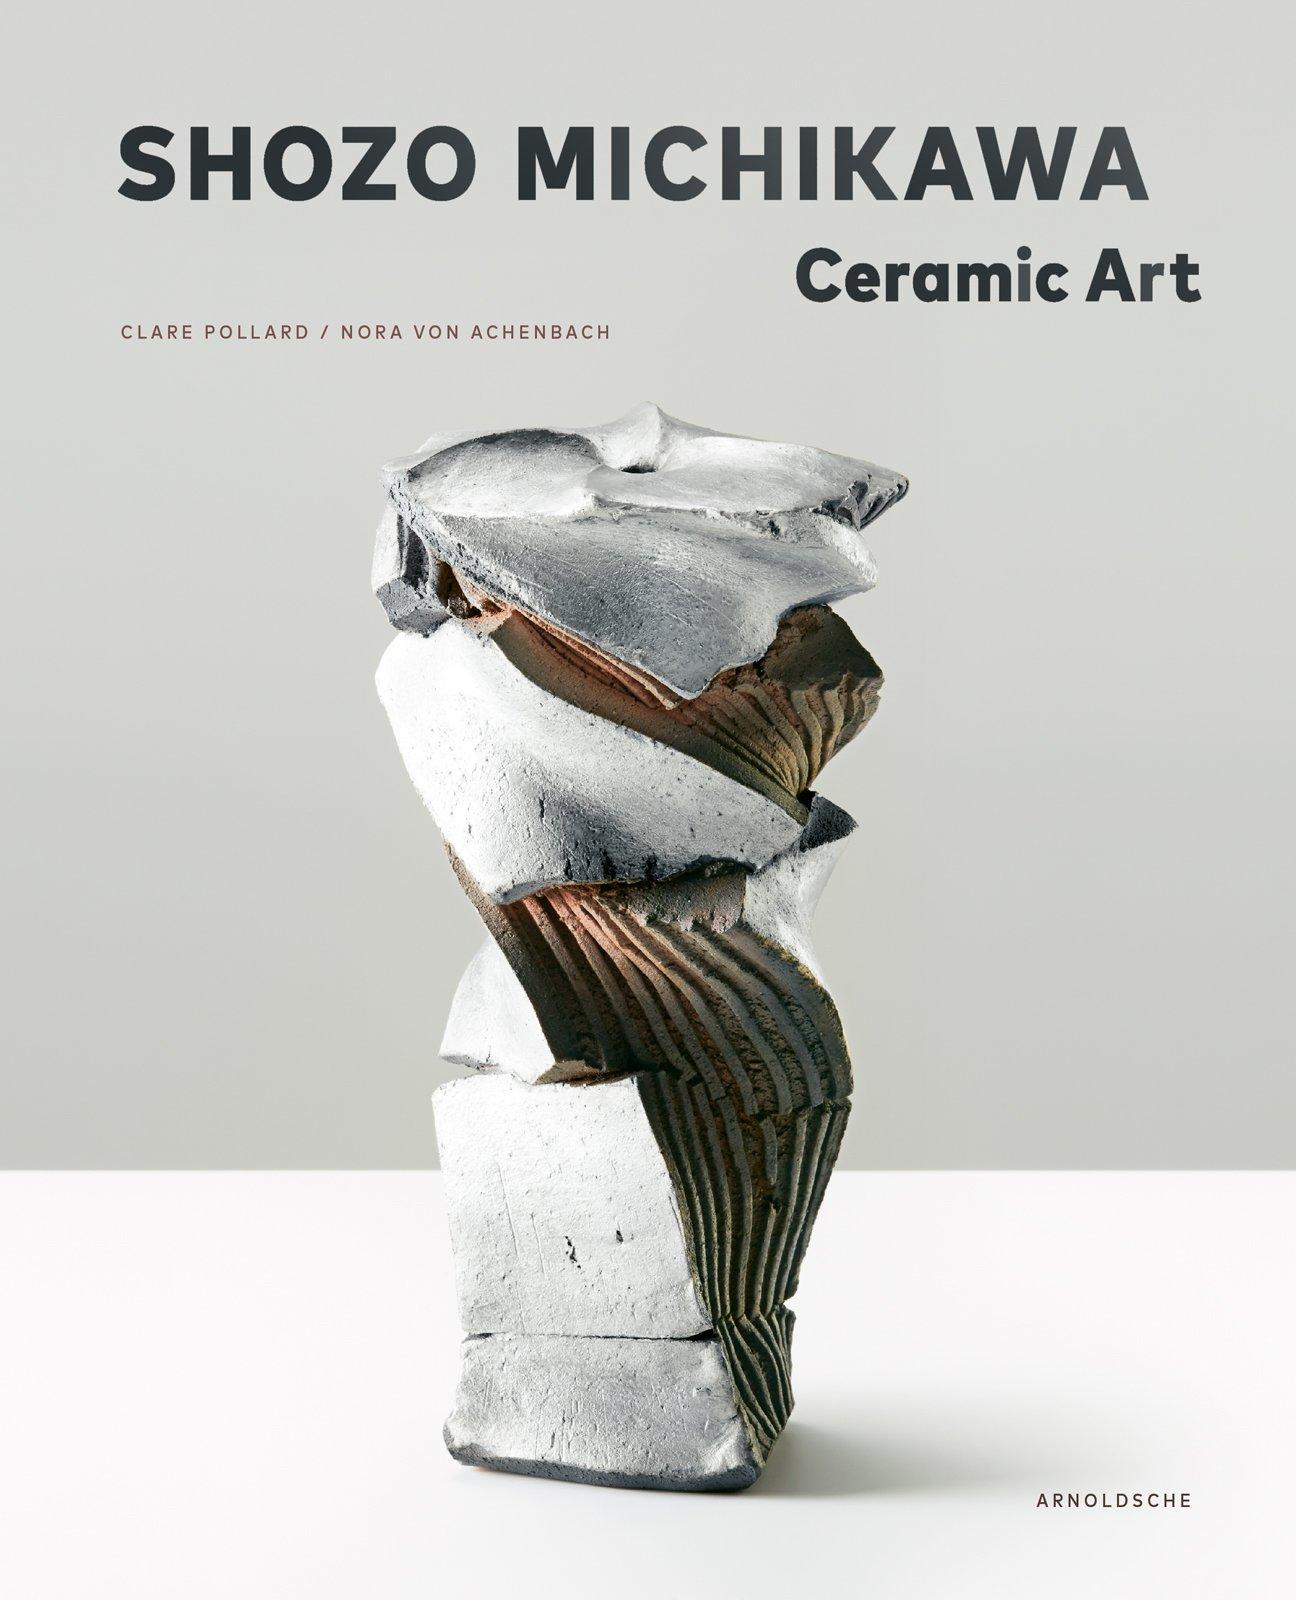 Shozo Michikawa: Ceramic Art